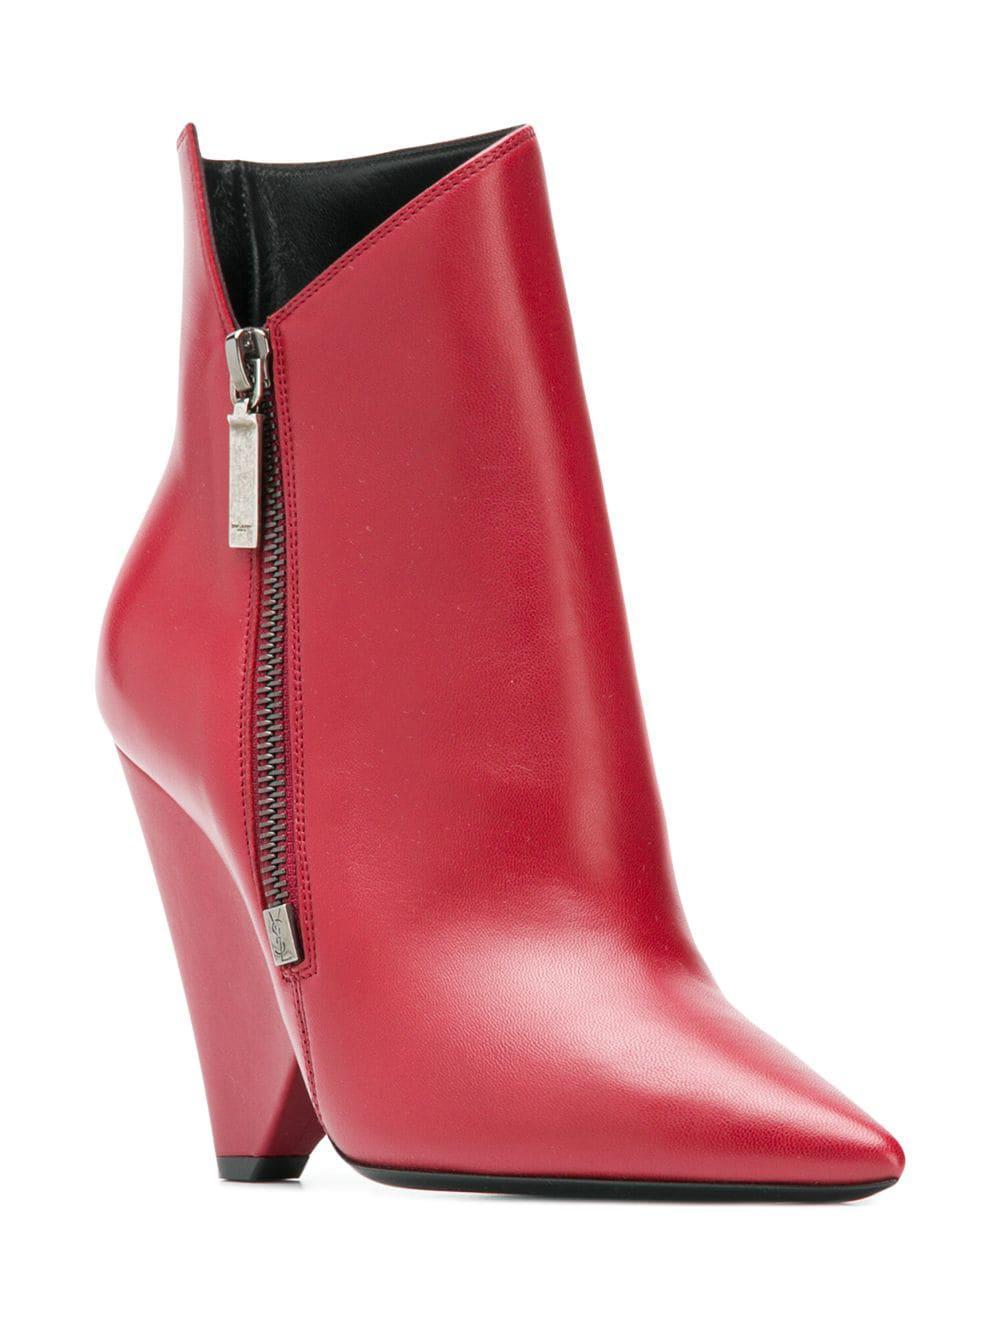 b2397a3ddab Lyst - Saint Laurent Niki 85 Asymmetric Boots in Red - Save 40%